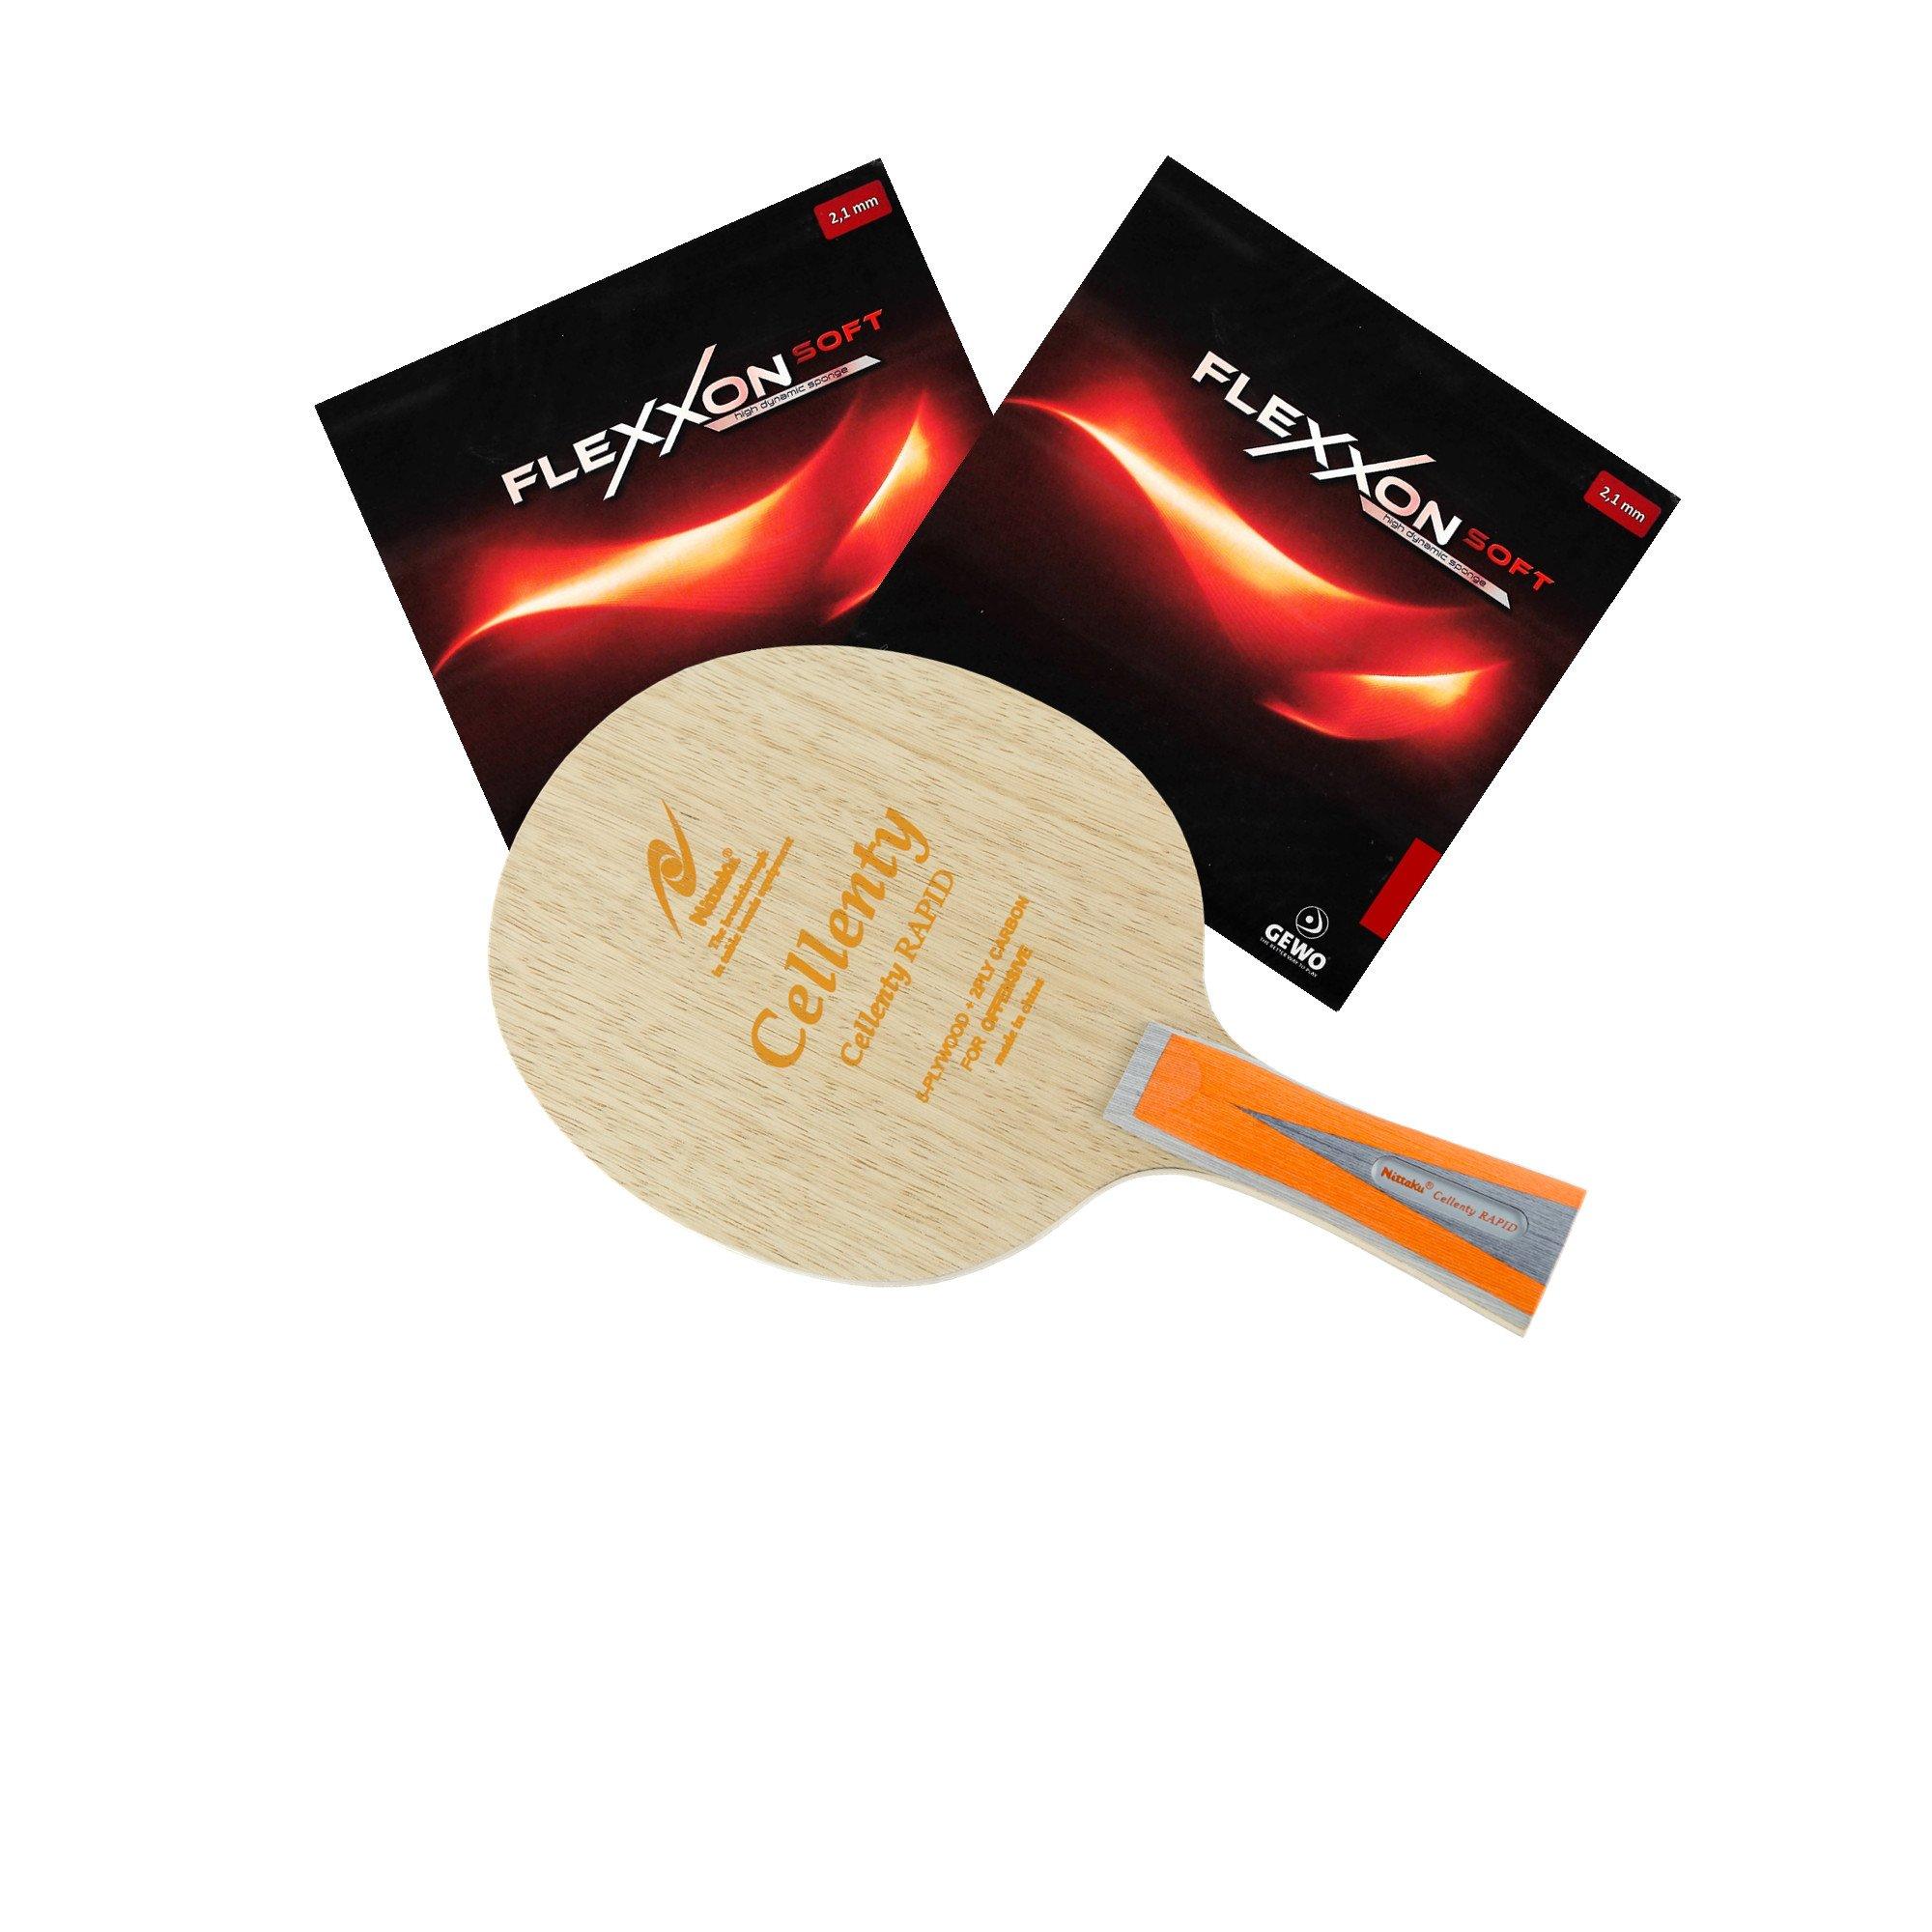 Nittaku Cellenty Rapid Carbon FL + Gewo Flexxon Soft Table Tennis Racket